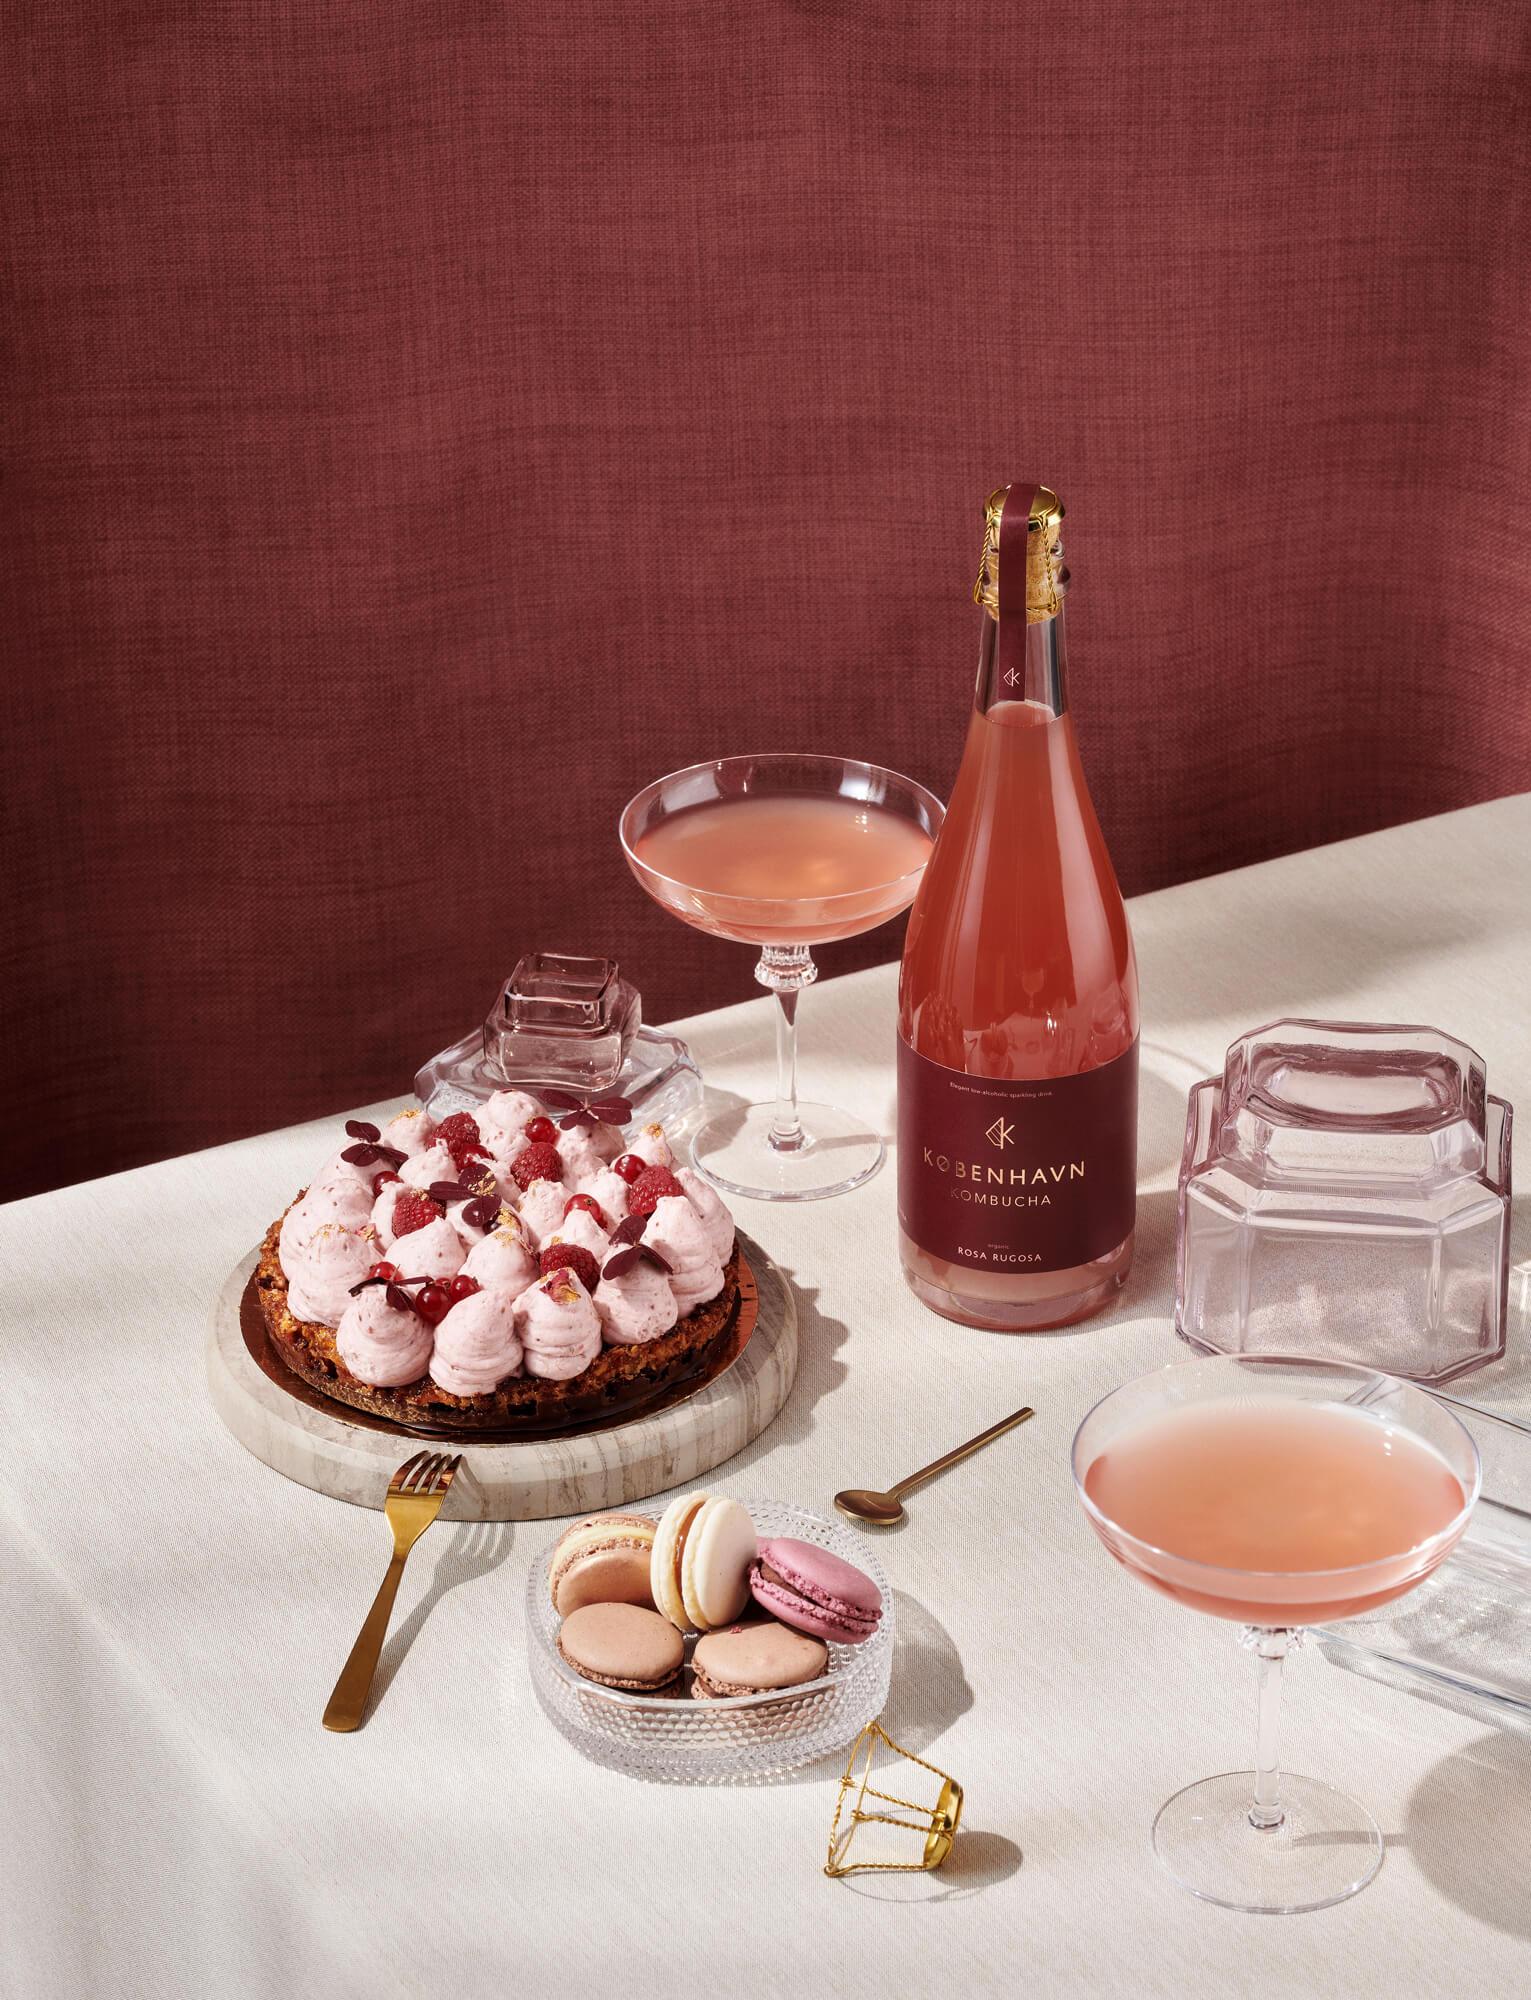 KBH KOMBUCHA rosa cake - København Kombucha